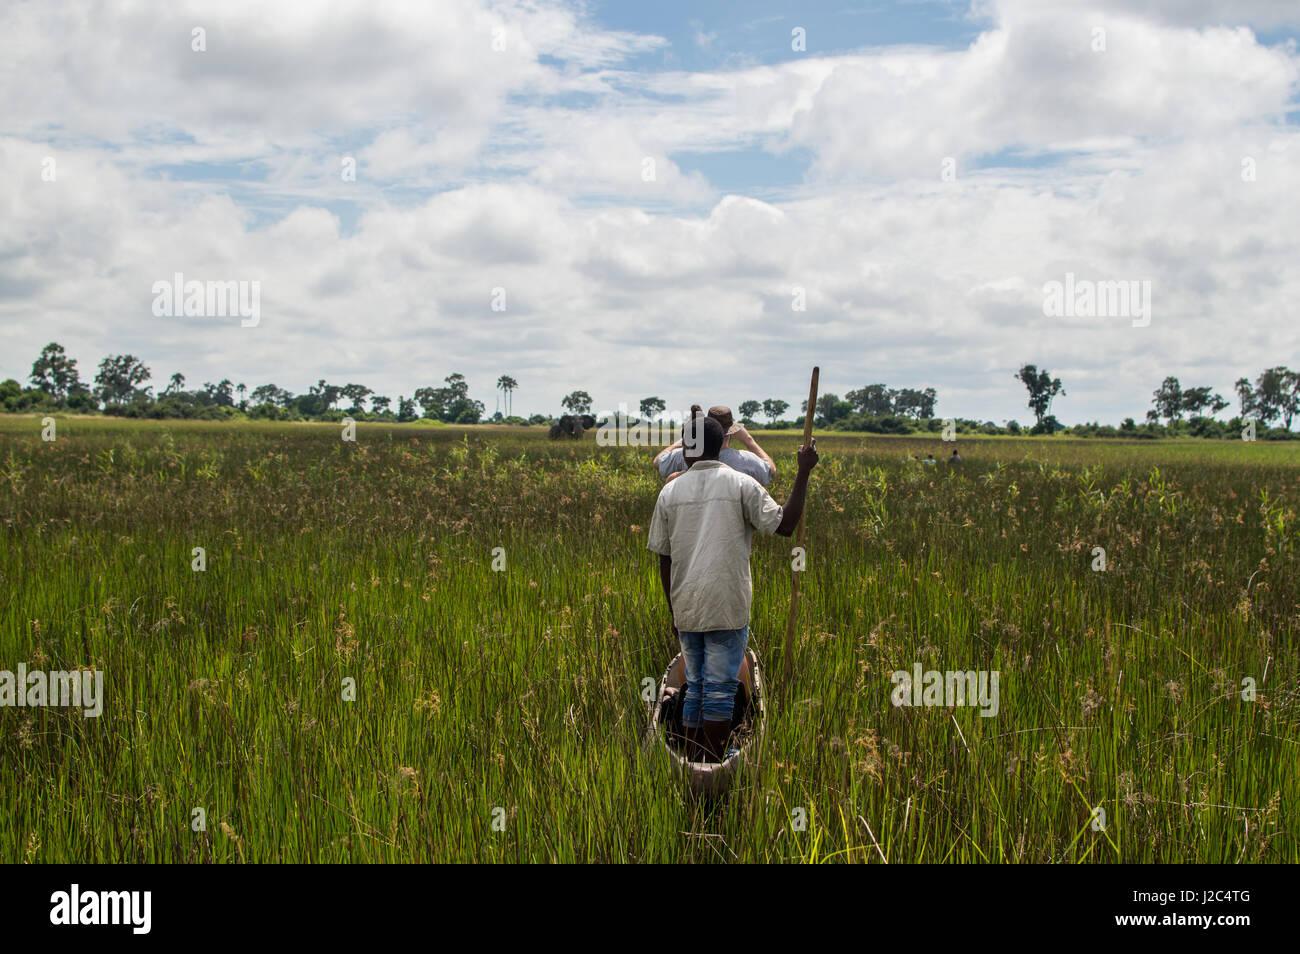 Encountering a Wild Elephant during a Mokoro Canoe Trip in the Okavango Delta near Maun, Botswana - Stock Image